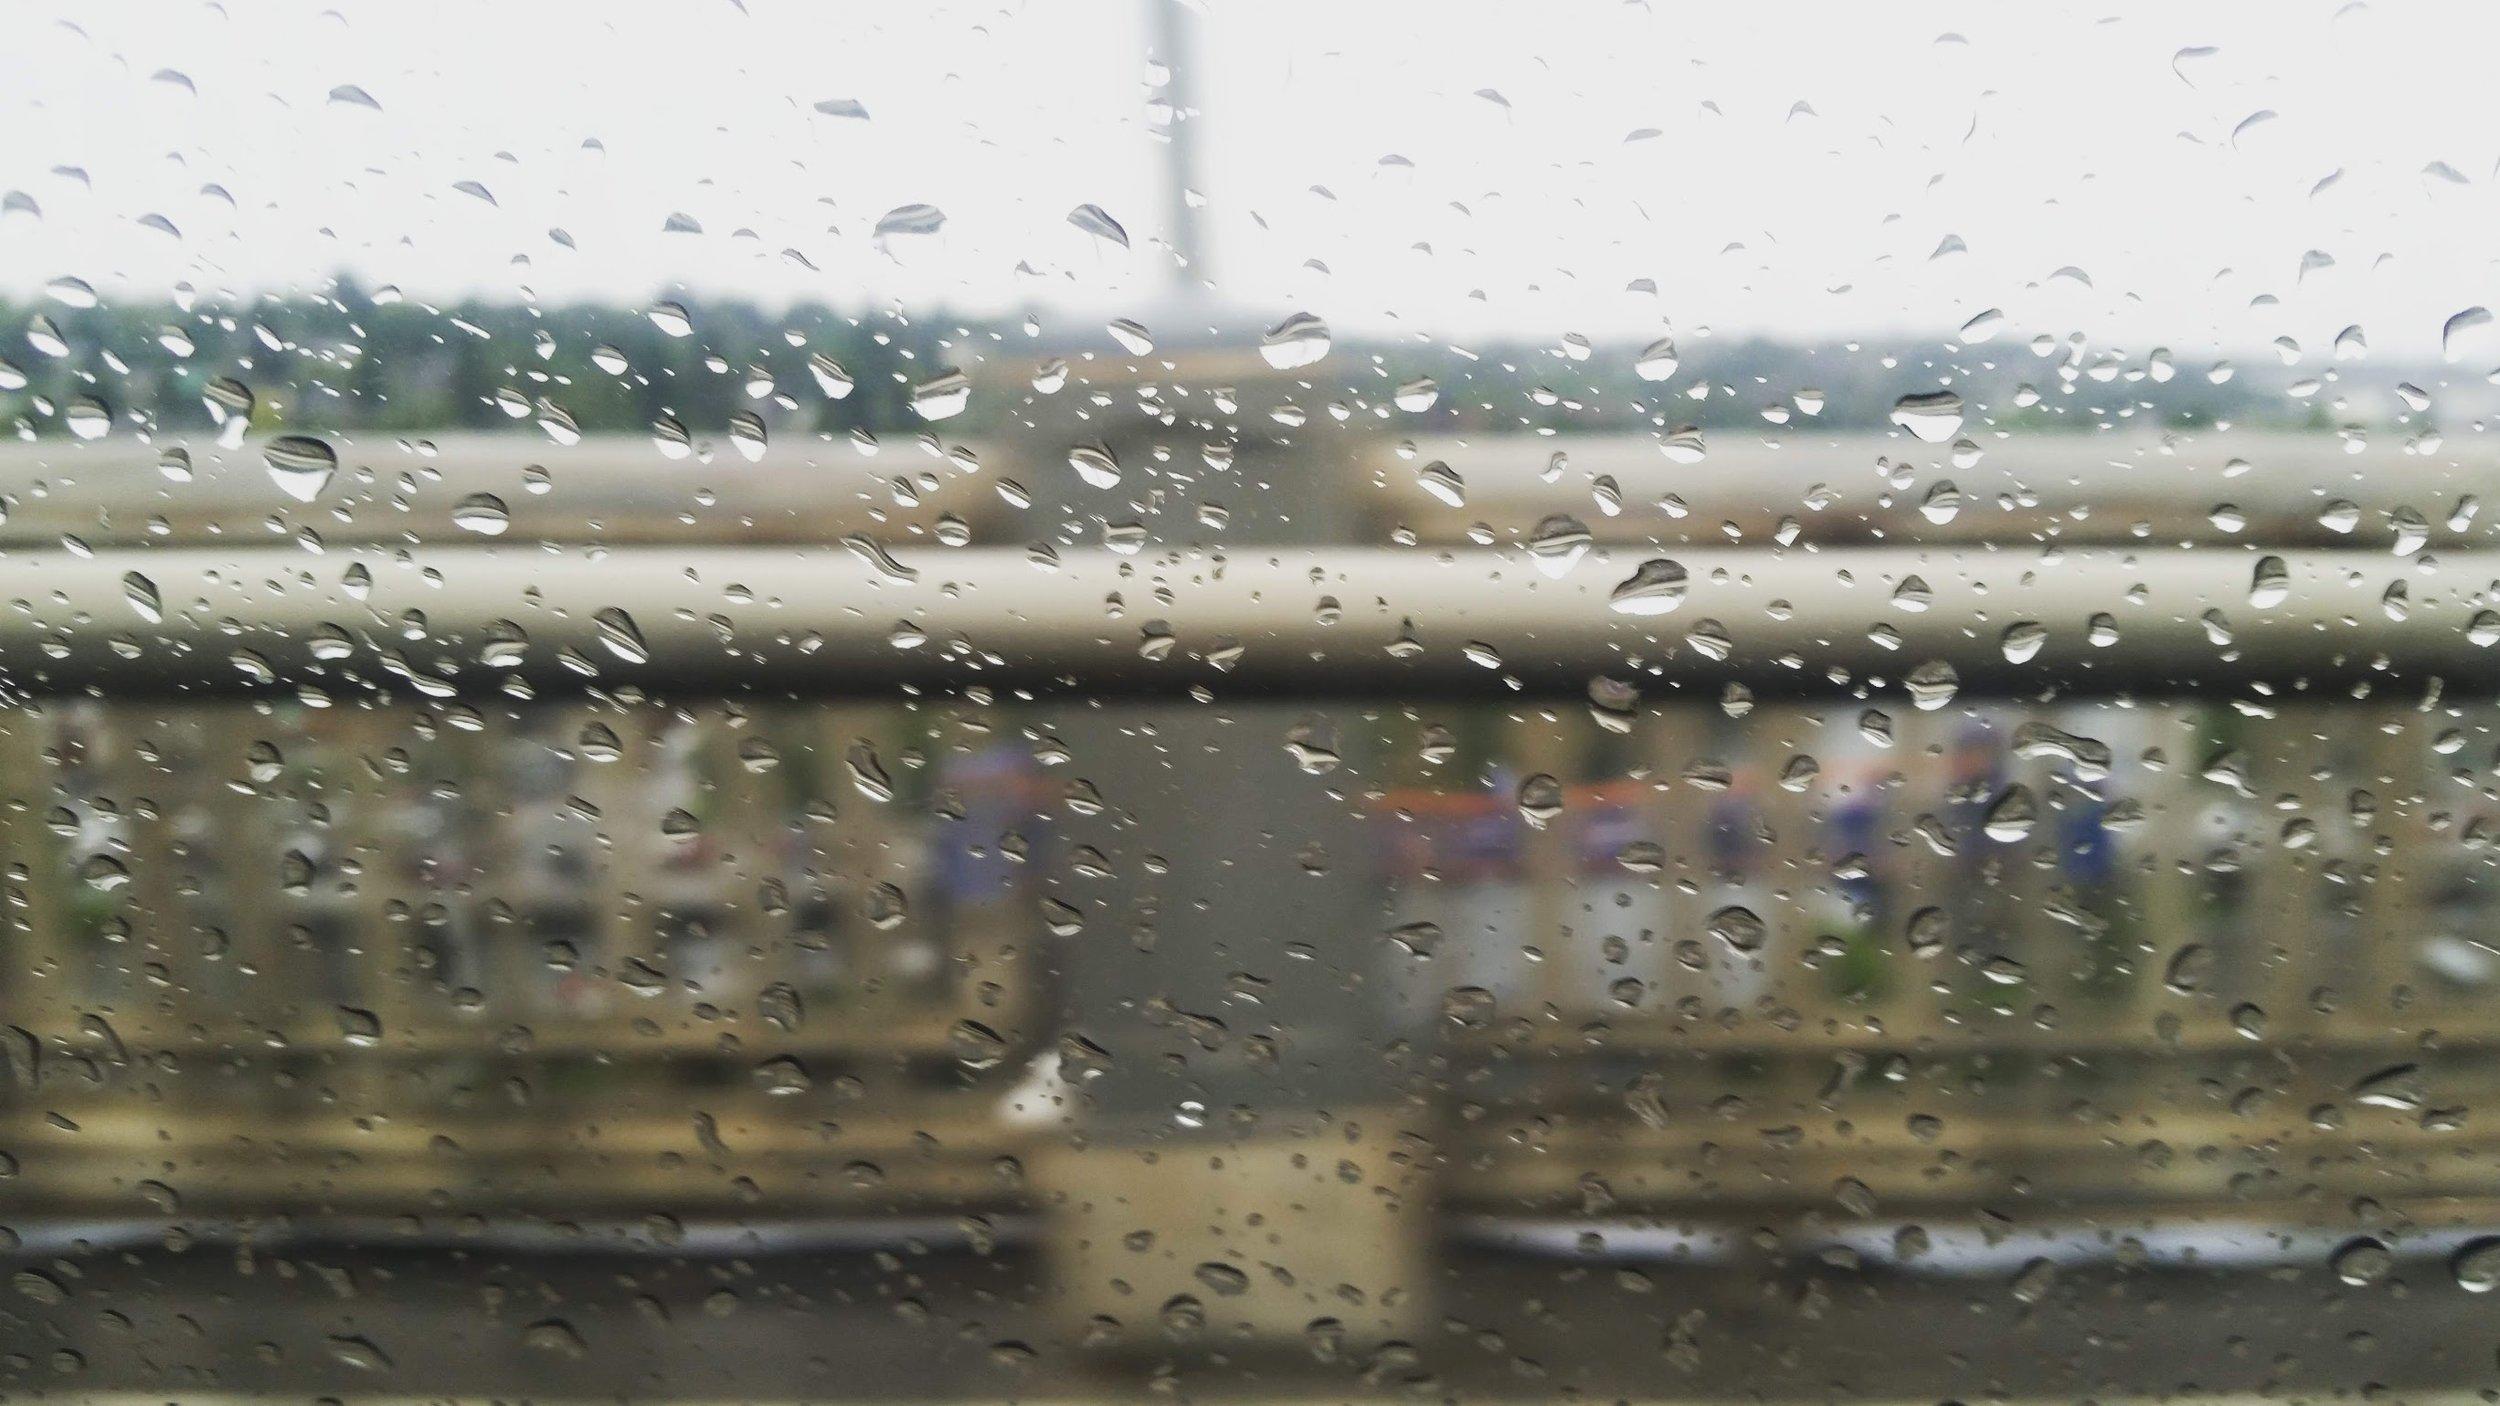 Rainy day in Los Angeles.